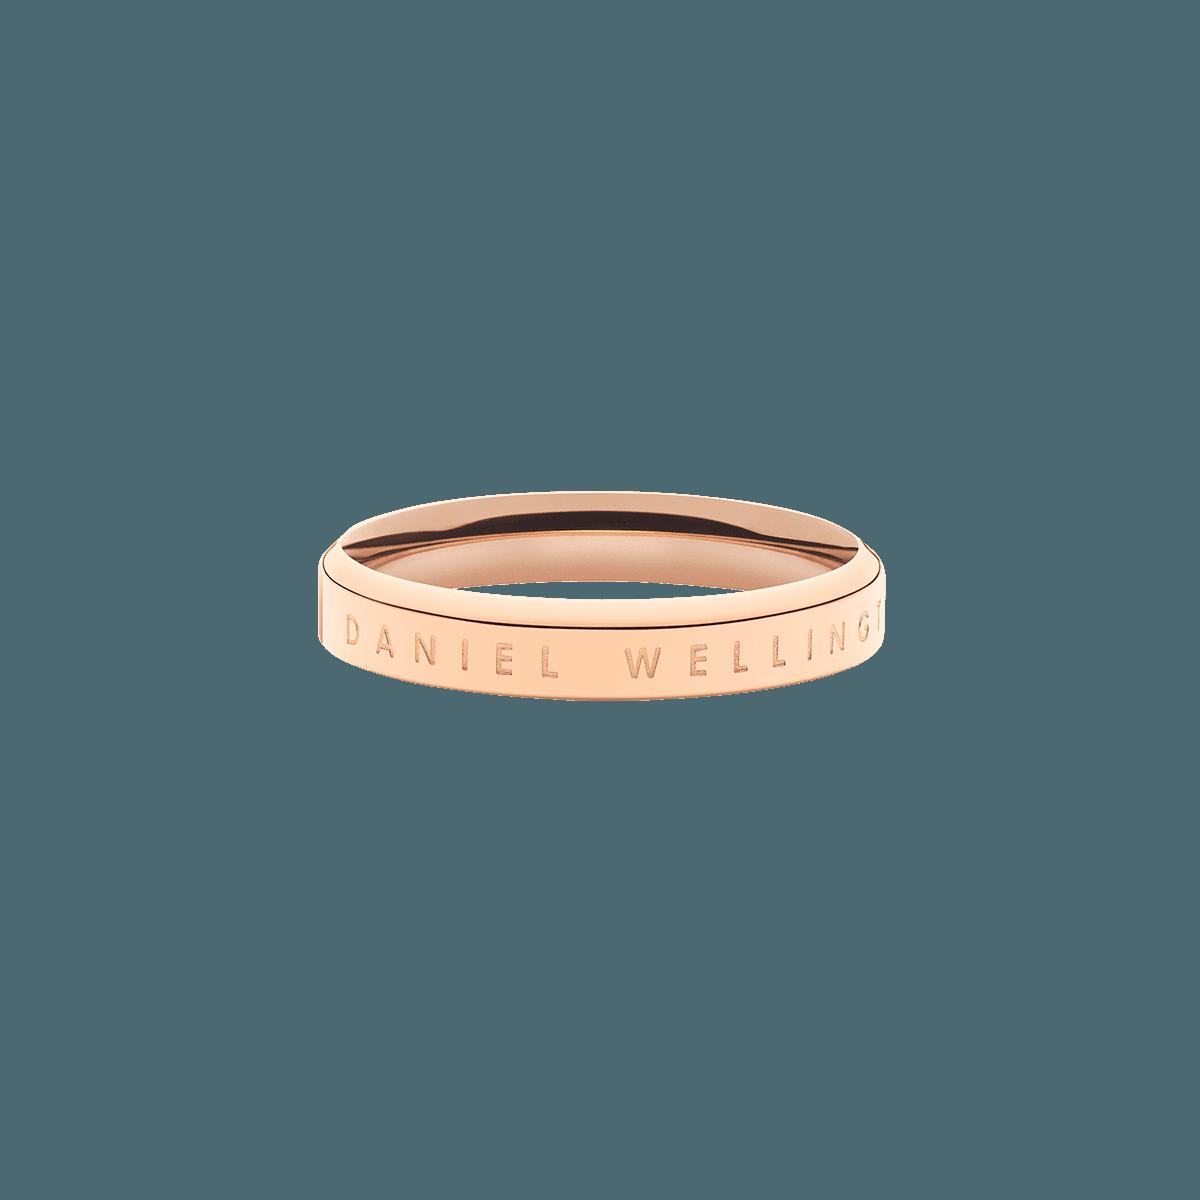 dw官网 dw手表官网 dw中国官网 dw官方旗舰店 DW DW官网  Classic Ring RG 54mm